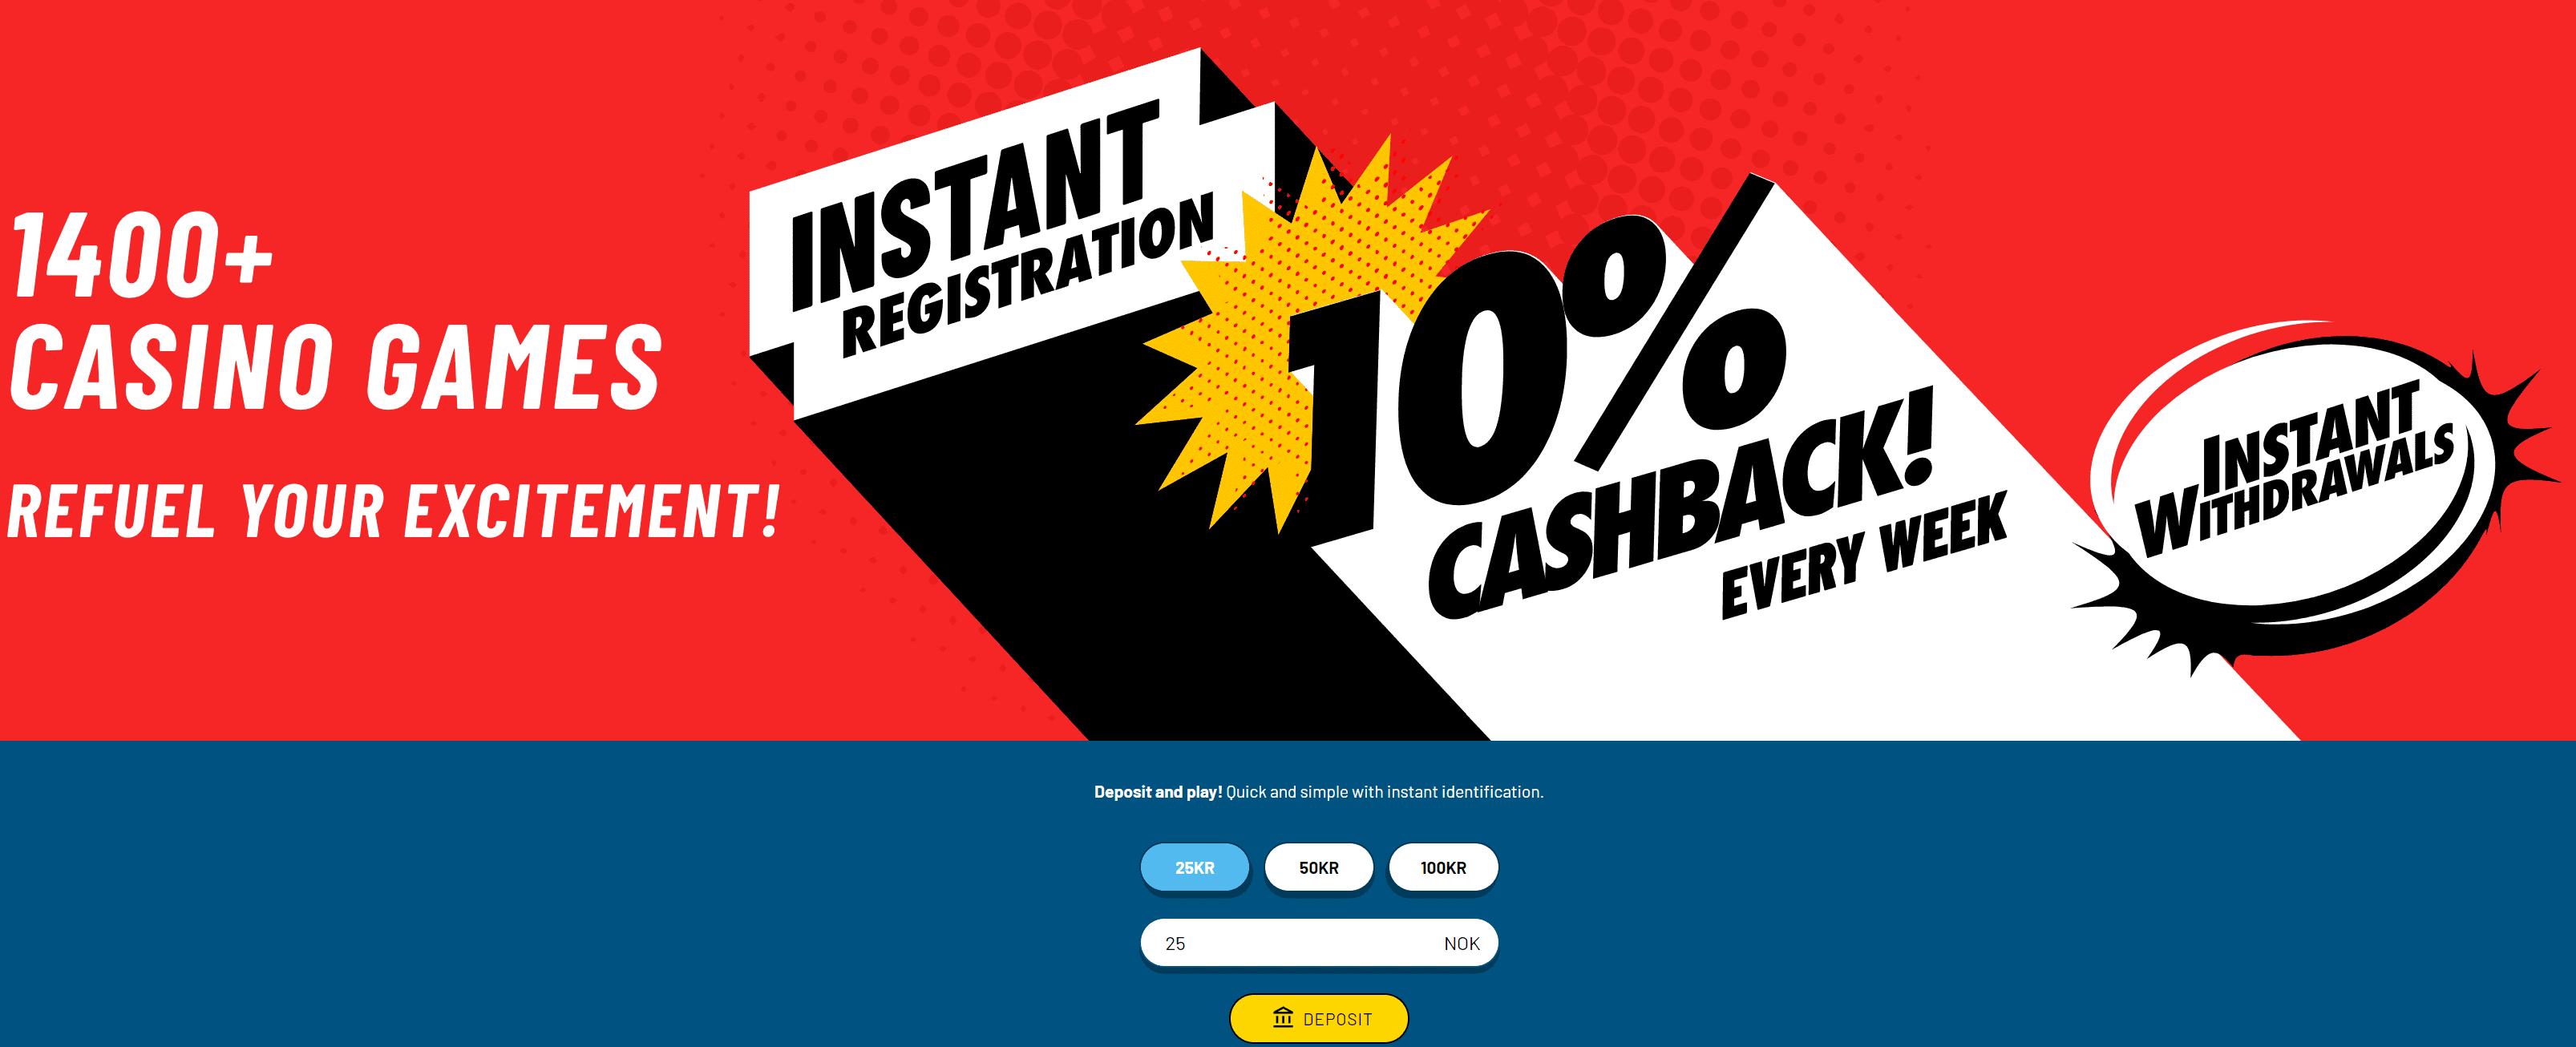 refuel casino 2020